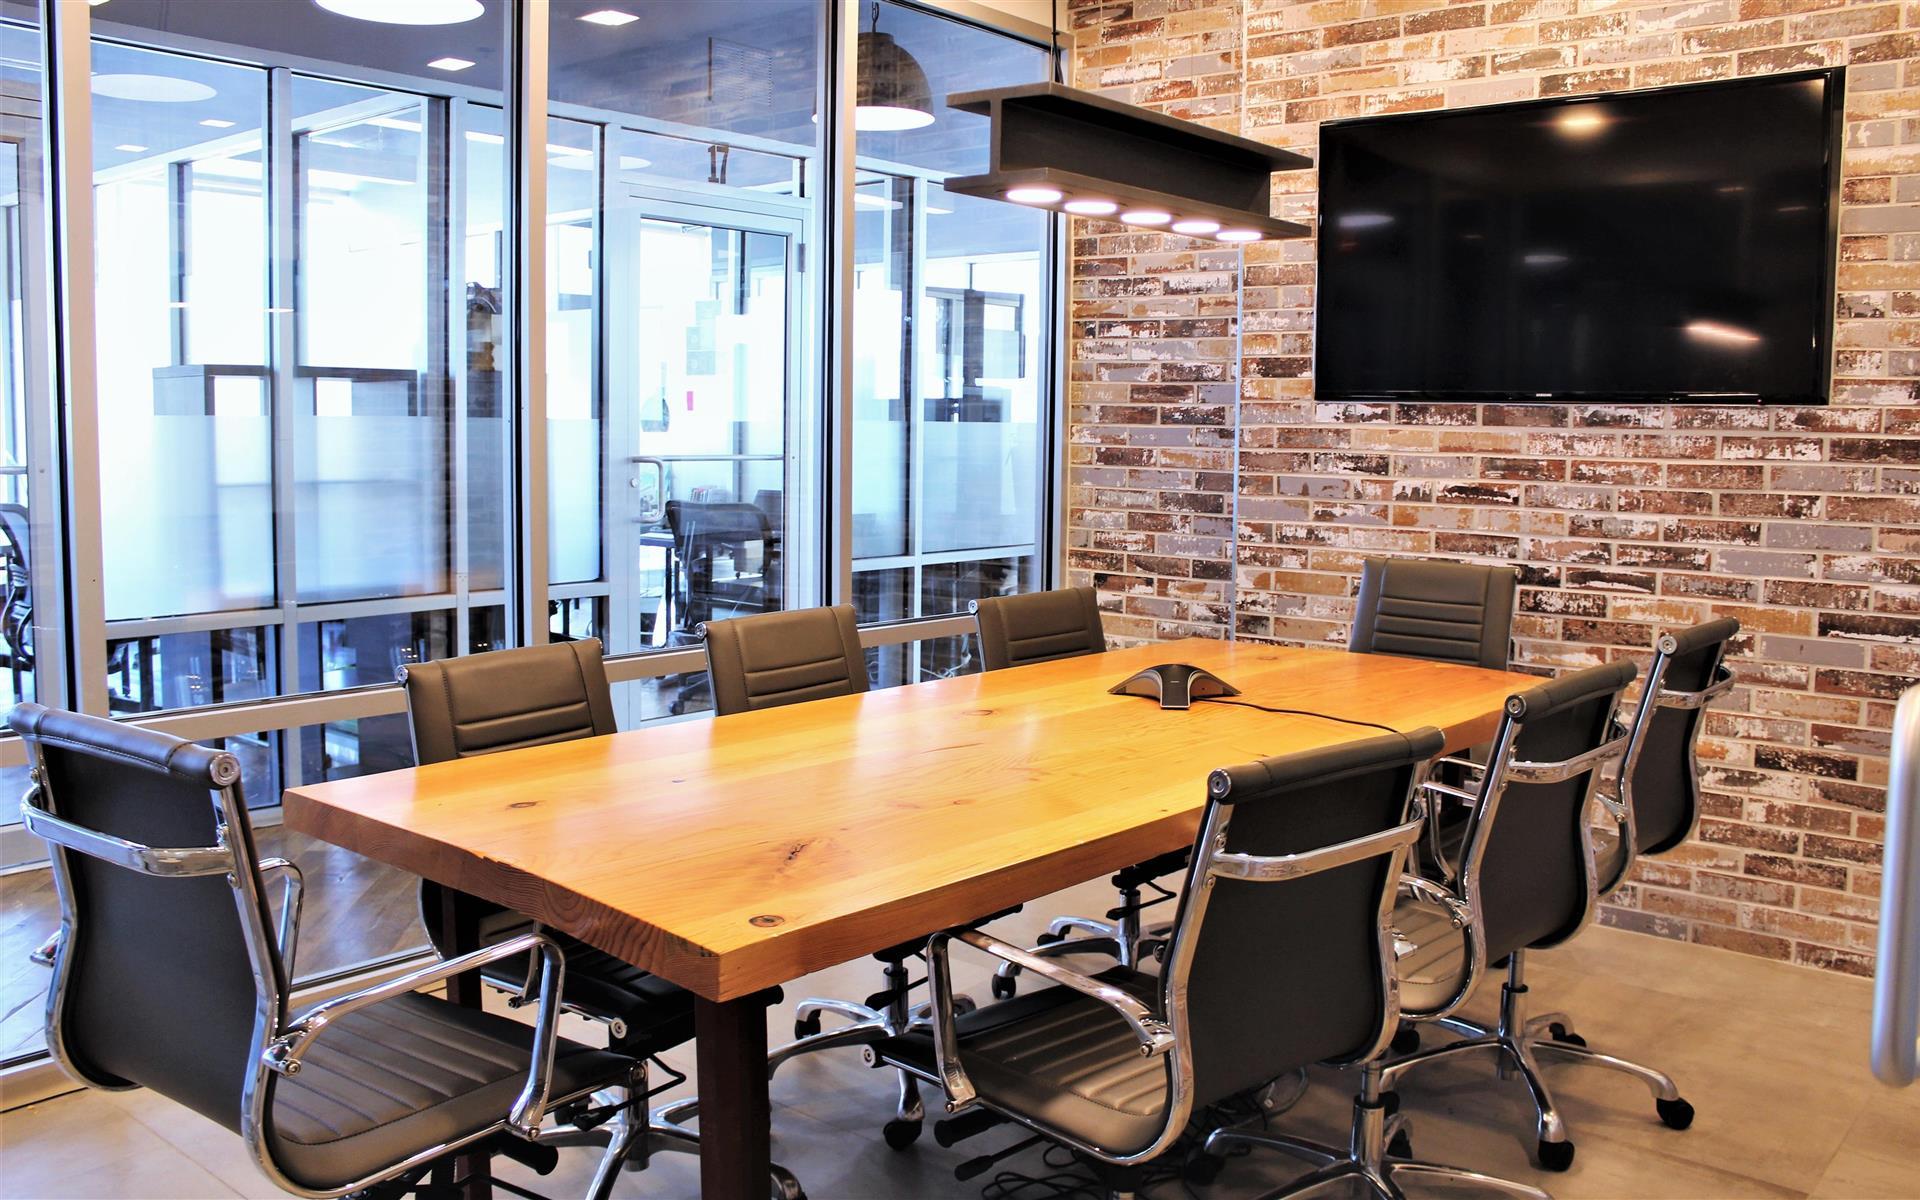 Green Desk - 34-18 Northern Blvd, LIC - Conference Room N - 34-18 Northern Blvd